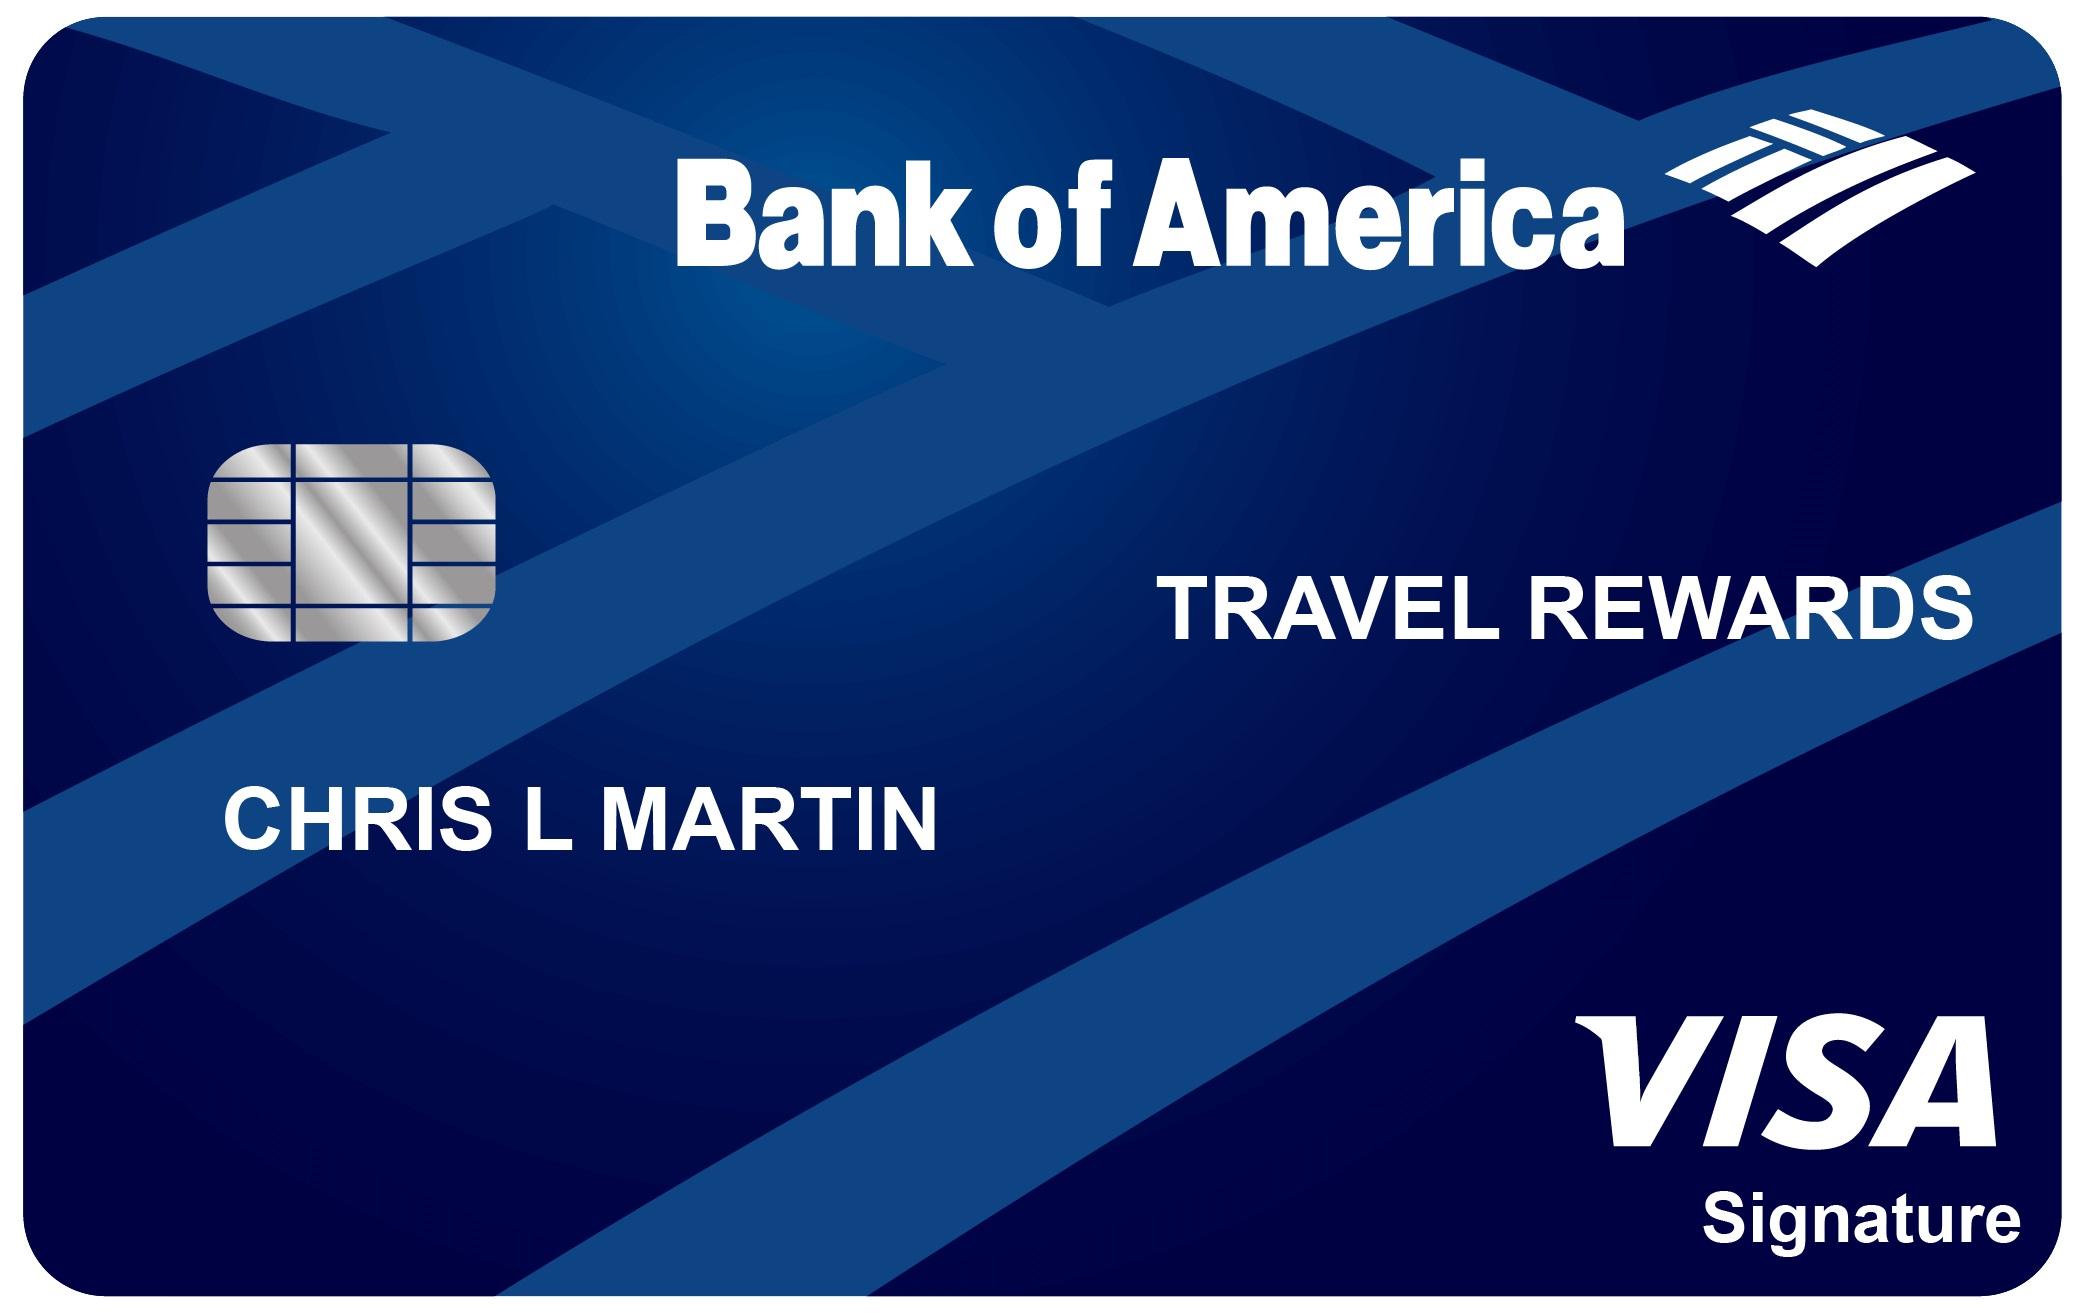 boa travel rewards credit card review 20187 update 25k offer us credit card guide - Travel Rewards Credit Card